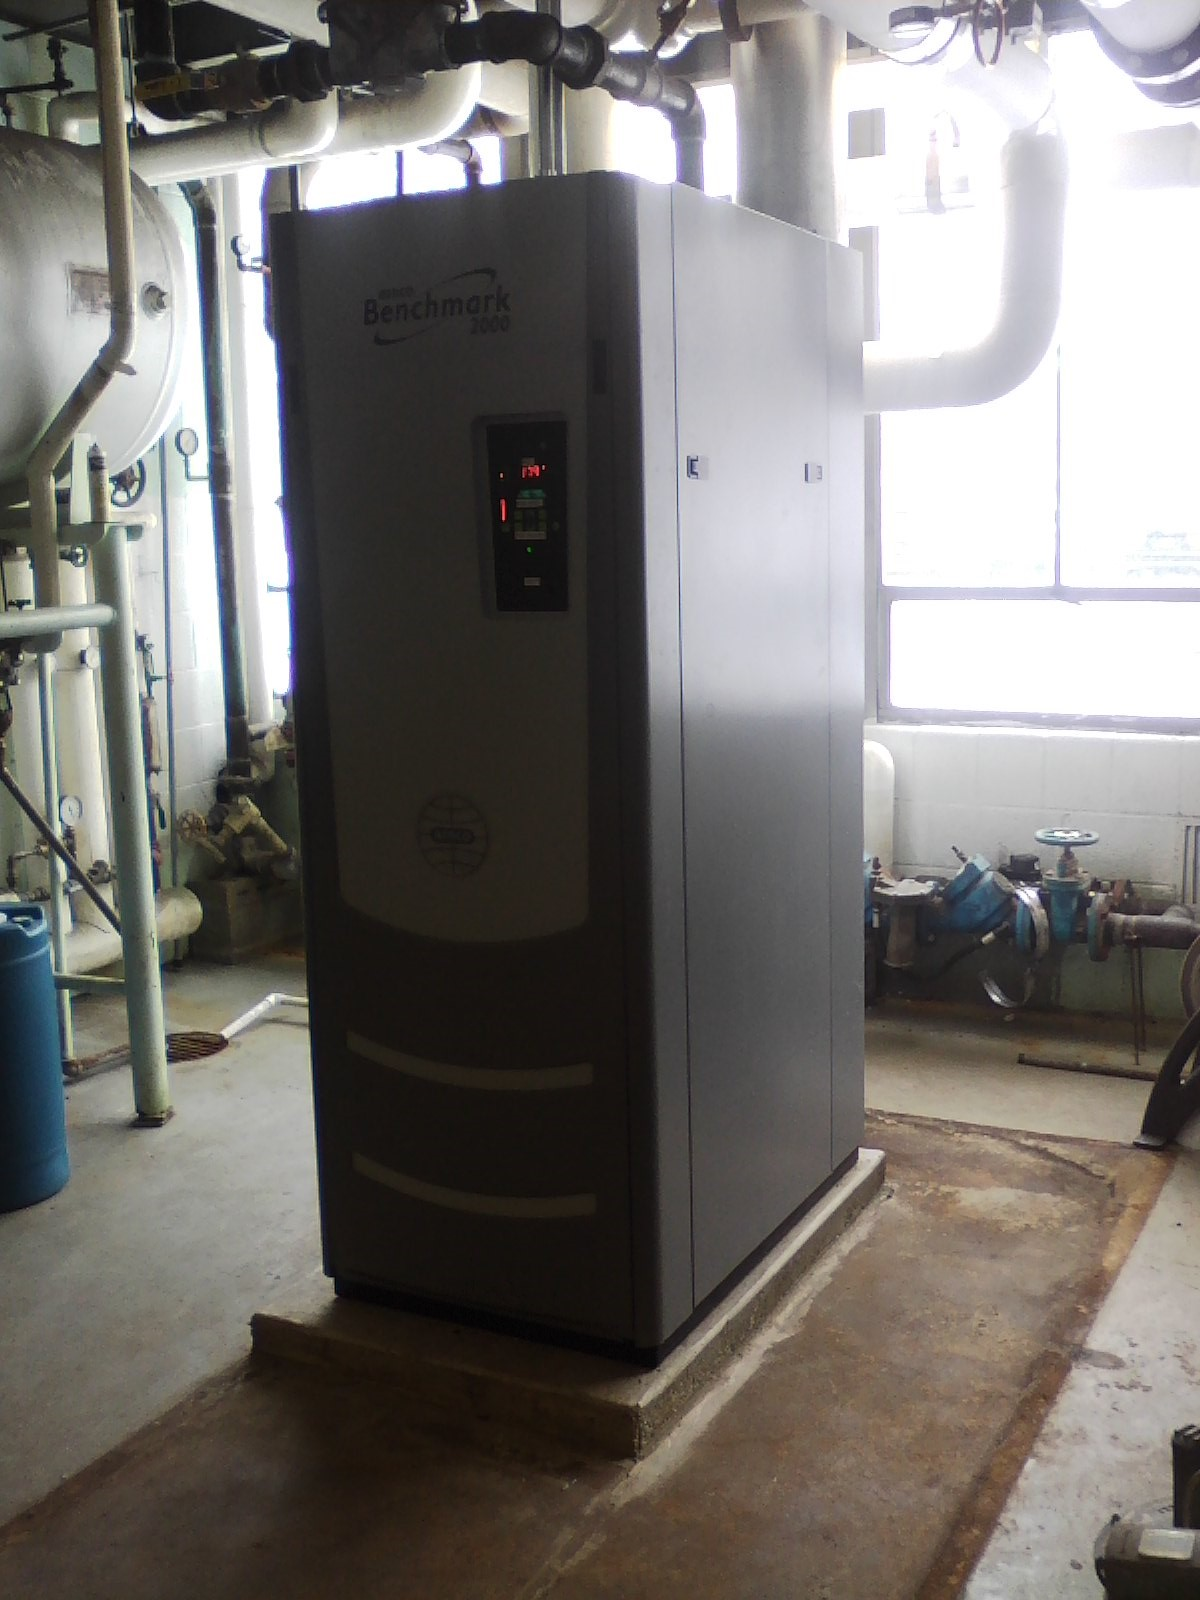 Benchmark 2000 Boiler 2